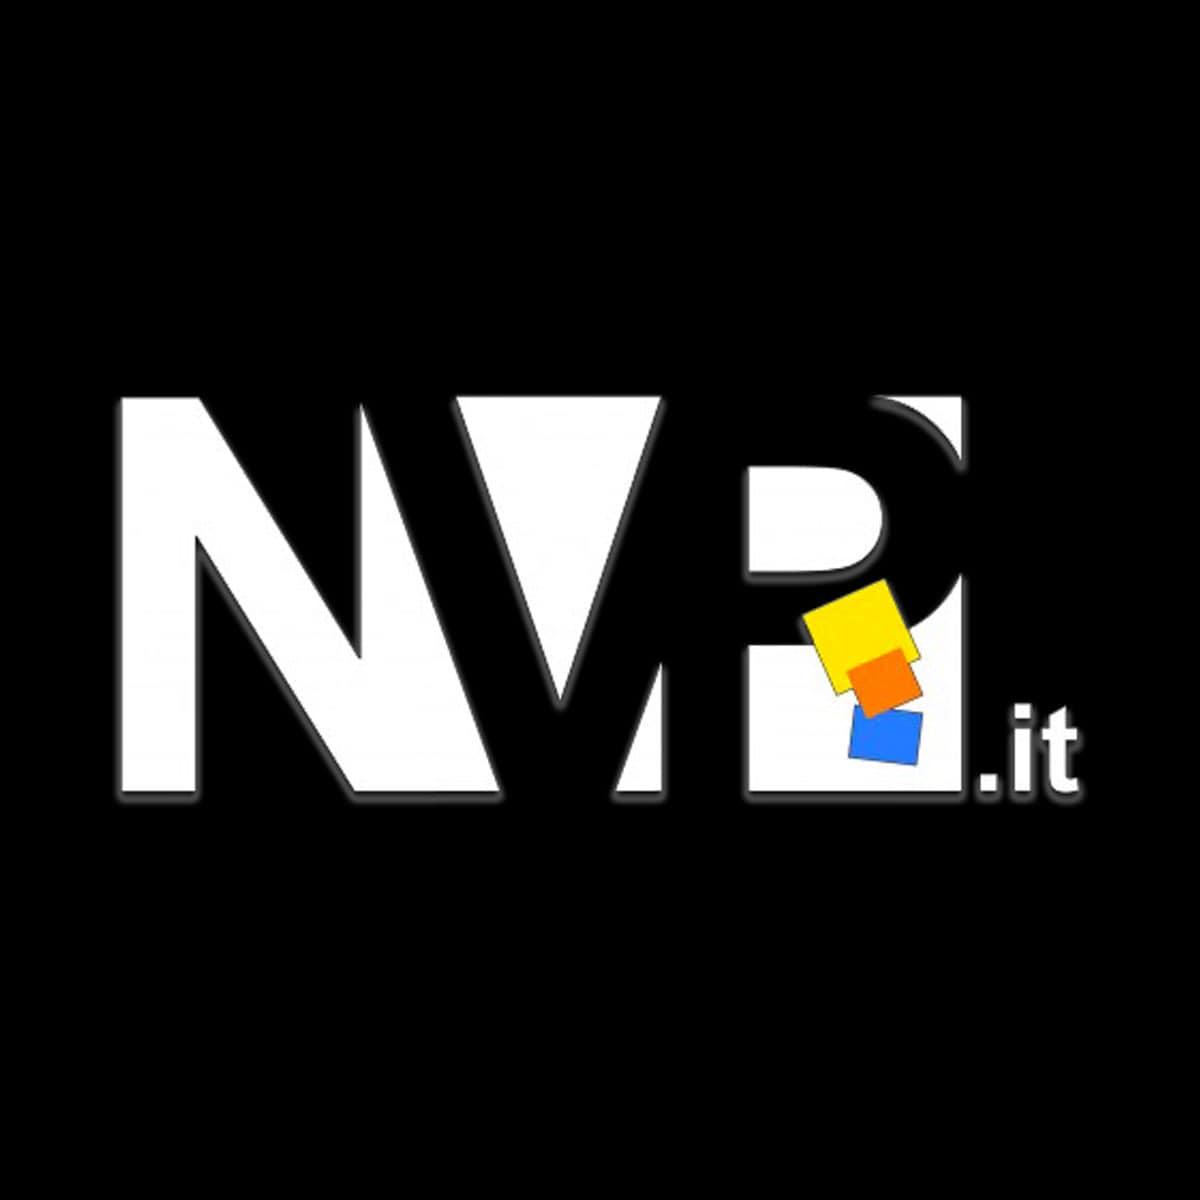 NVP, conosciamo meglio la società